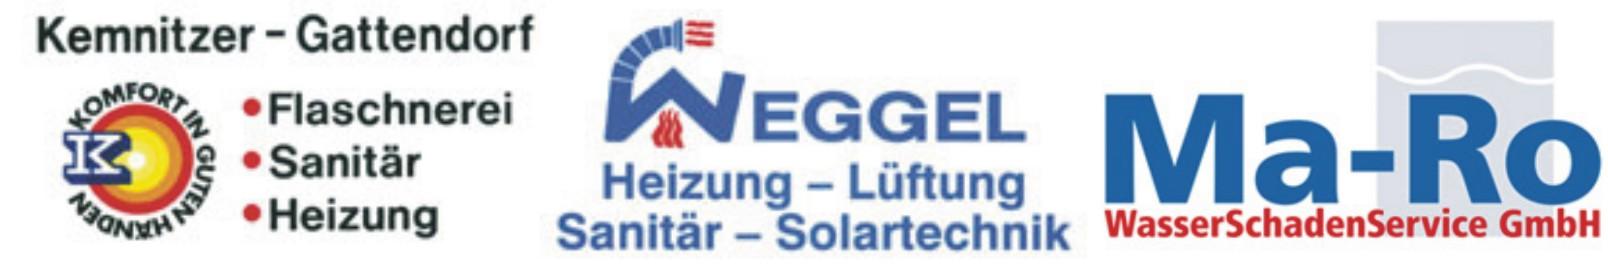 Kemnitzer GmbH / Weggel Haustechnik GmbH / Ma-Ro GmbH